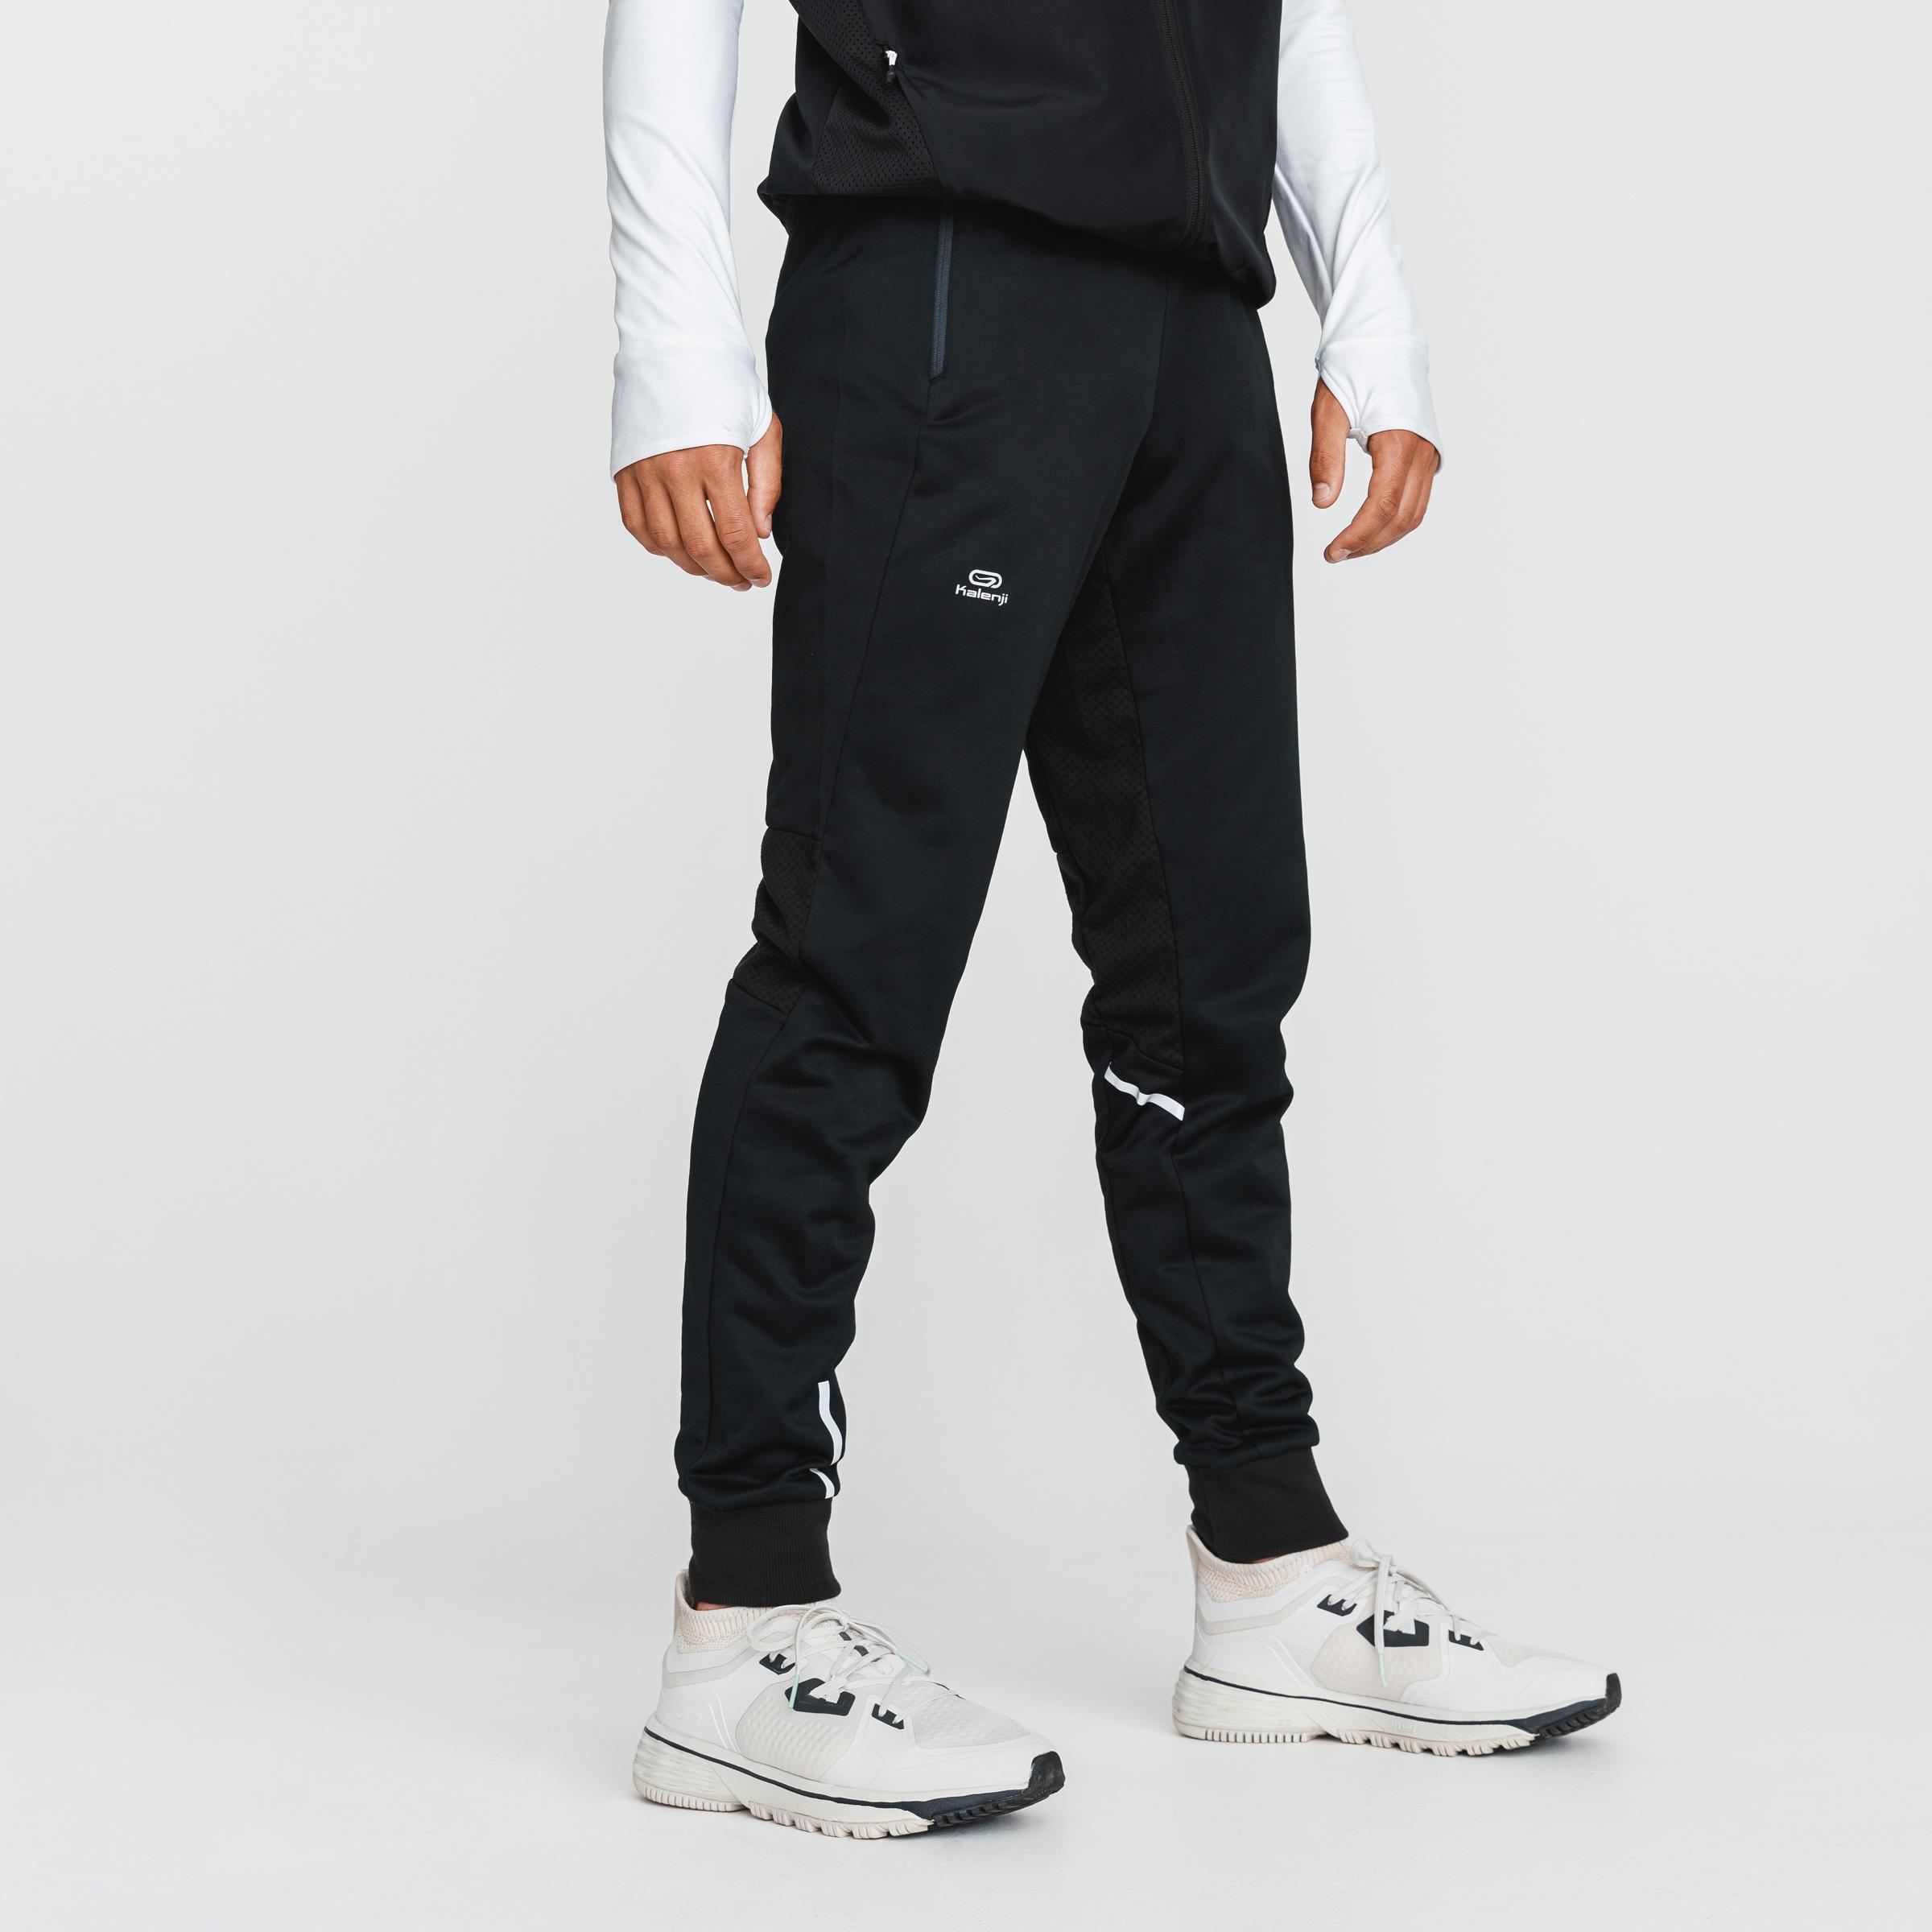 Pantalon Run Warm + Bărbați la Reducere poza